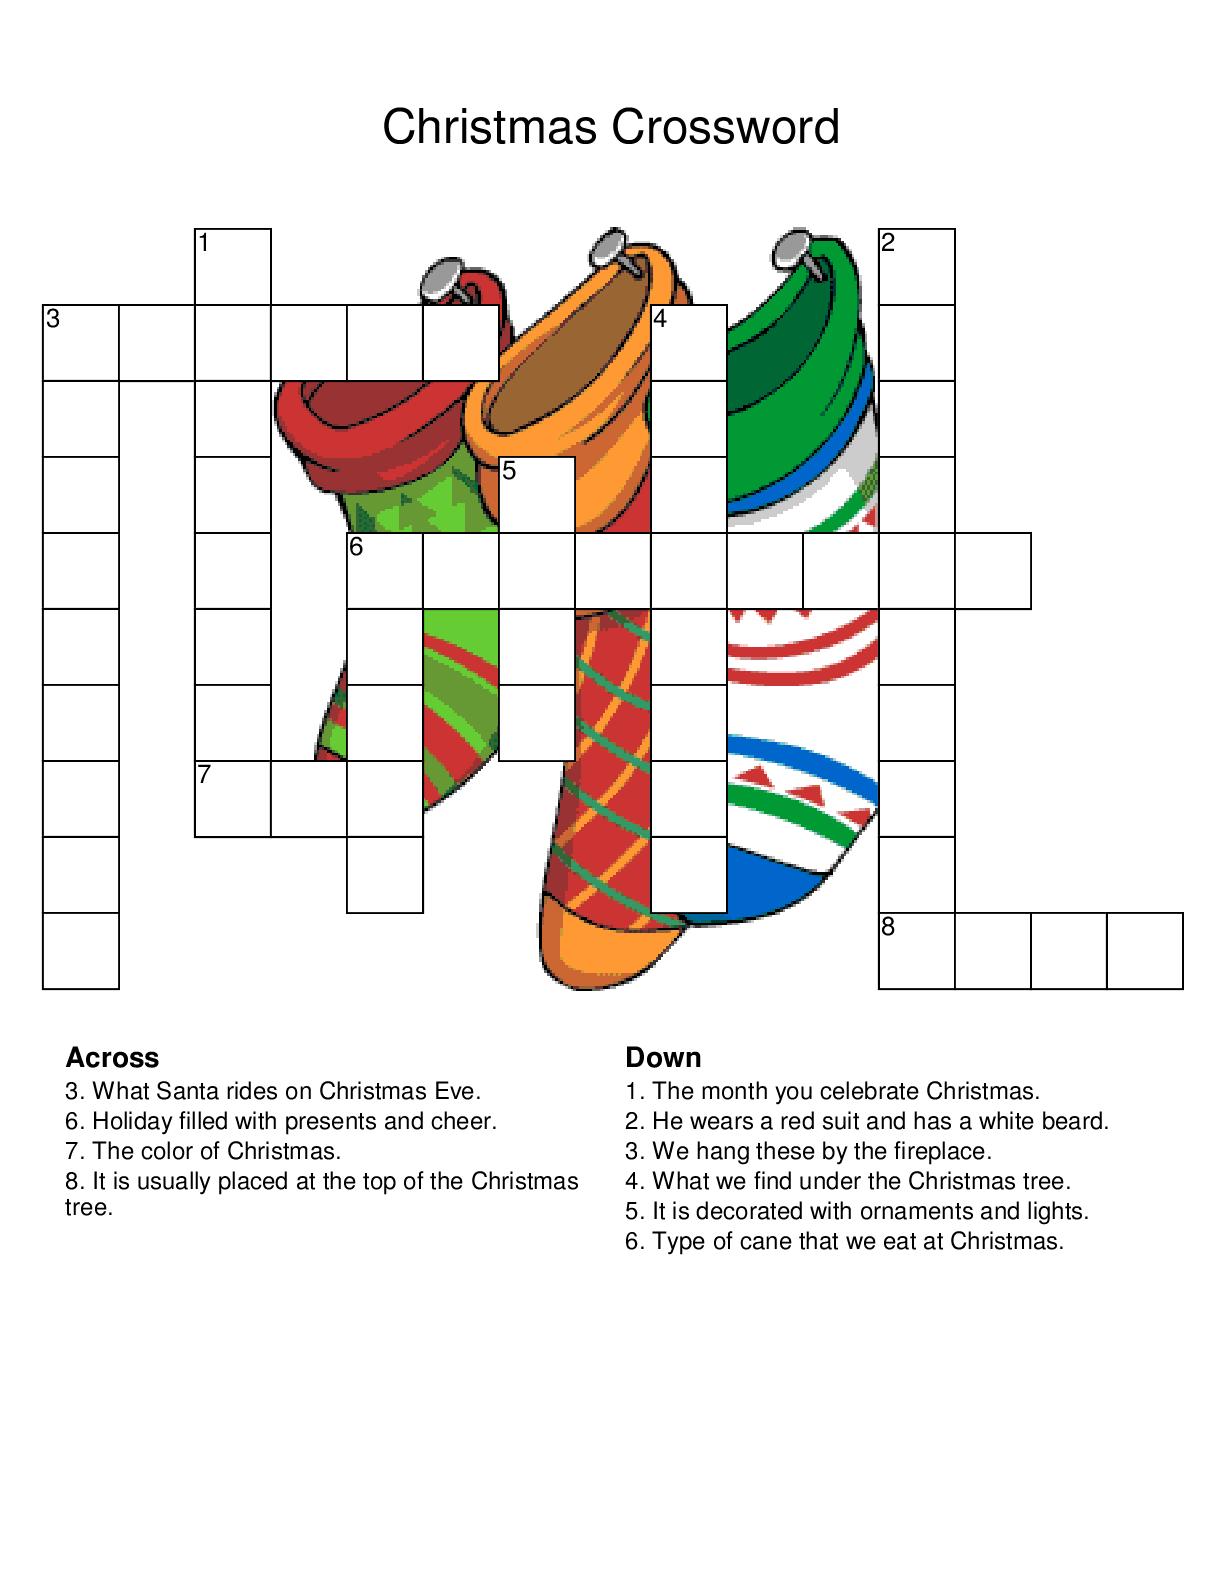 Christmas Crossword Puzzles